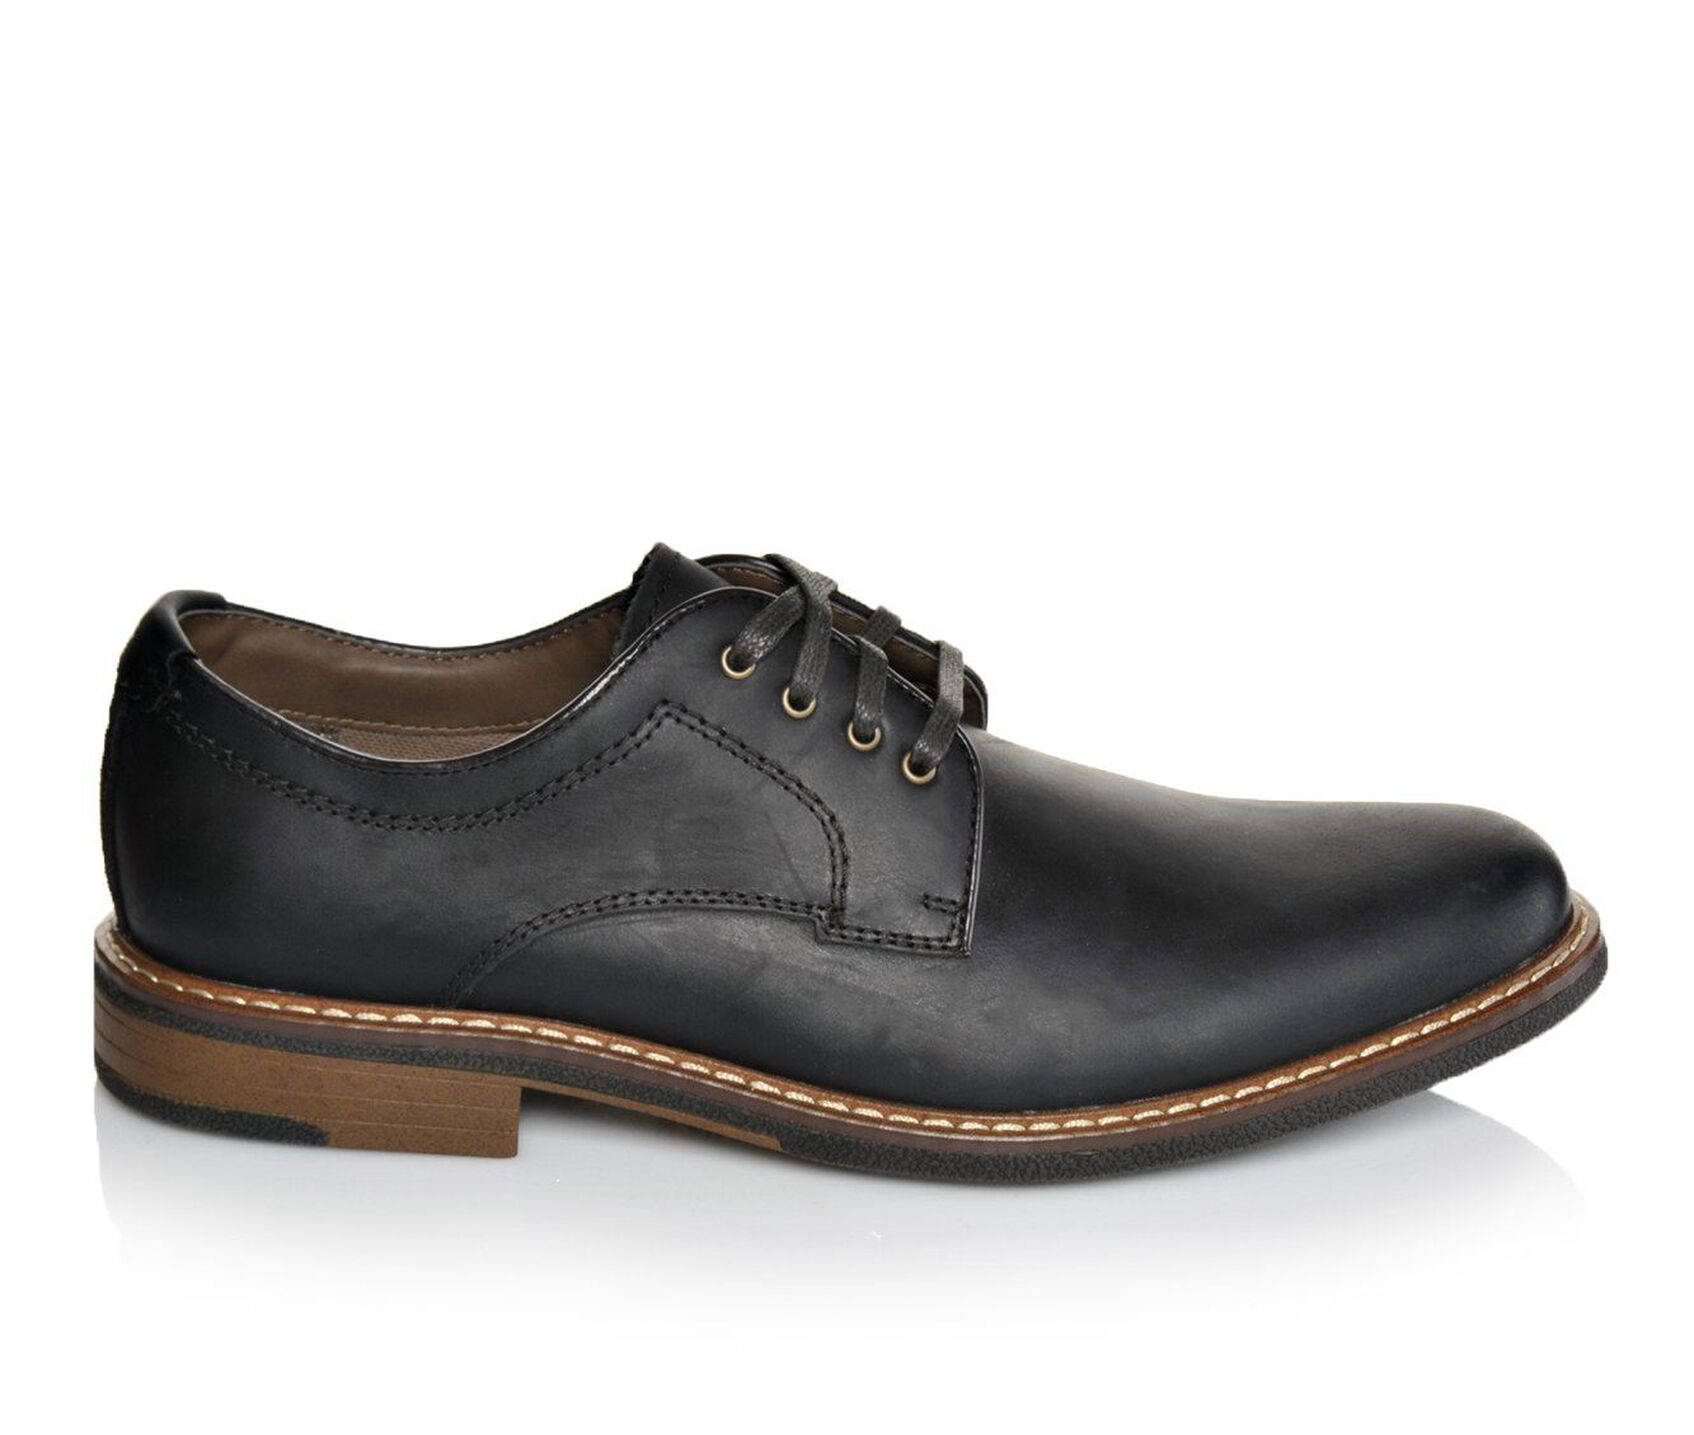 Dockers Shoes Dress